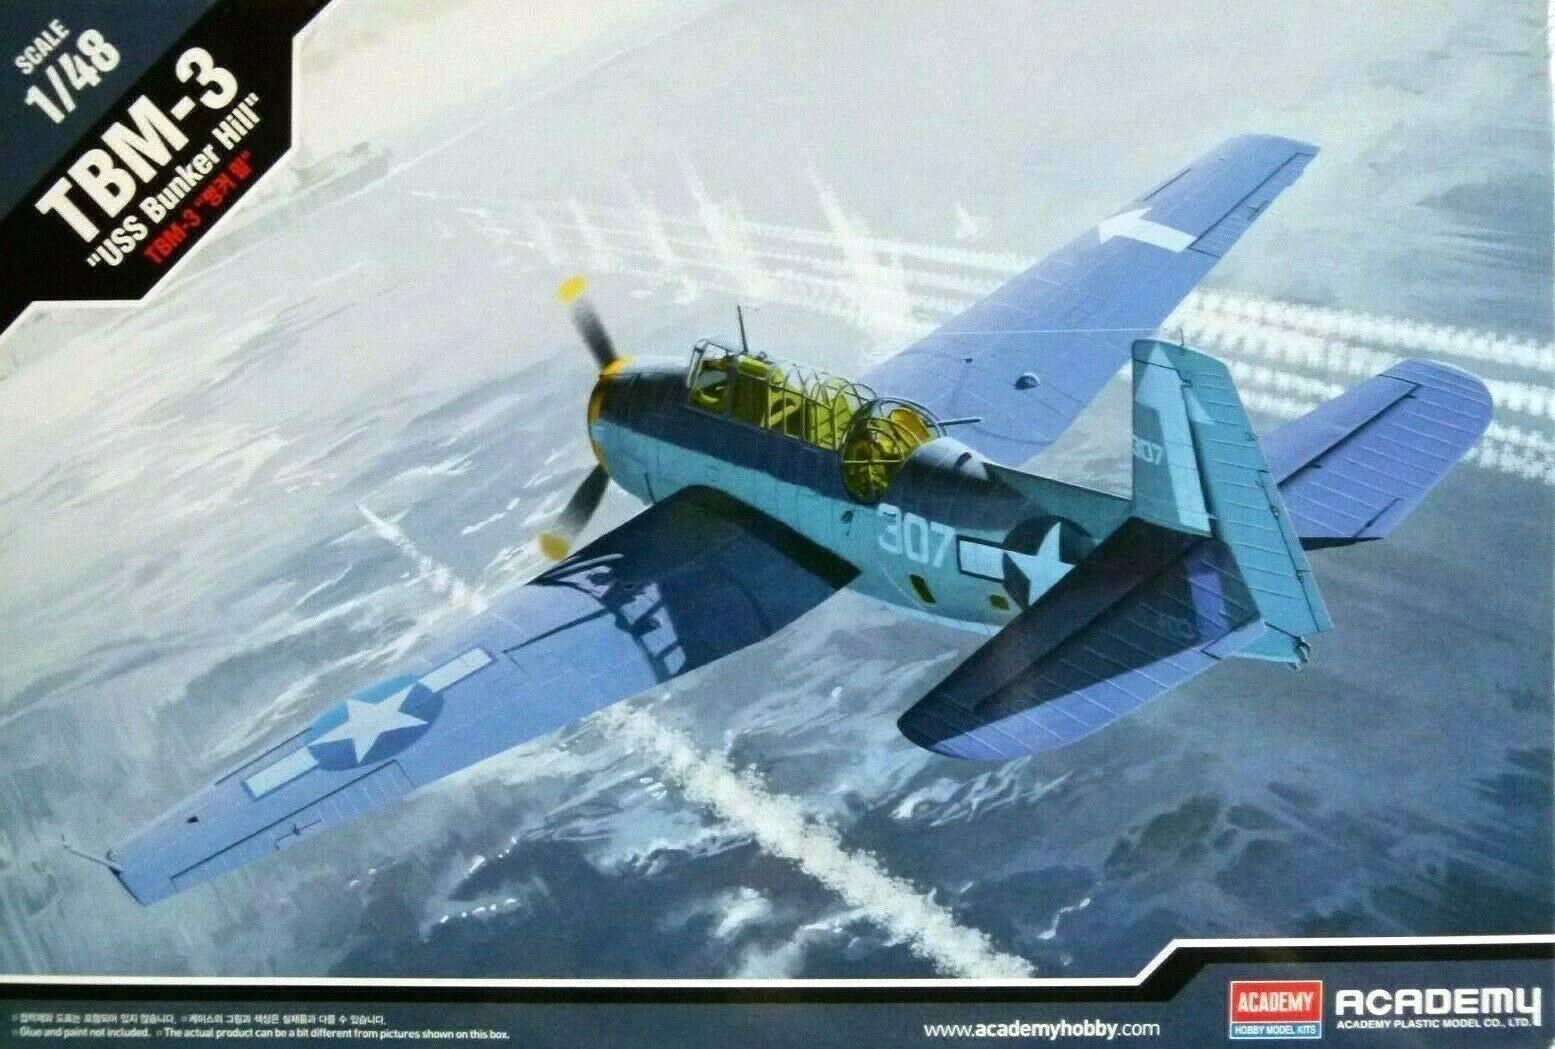 Academy 1 48 TBM-3  USS Bunker Hill  Aircraft Model Kit